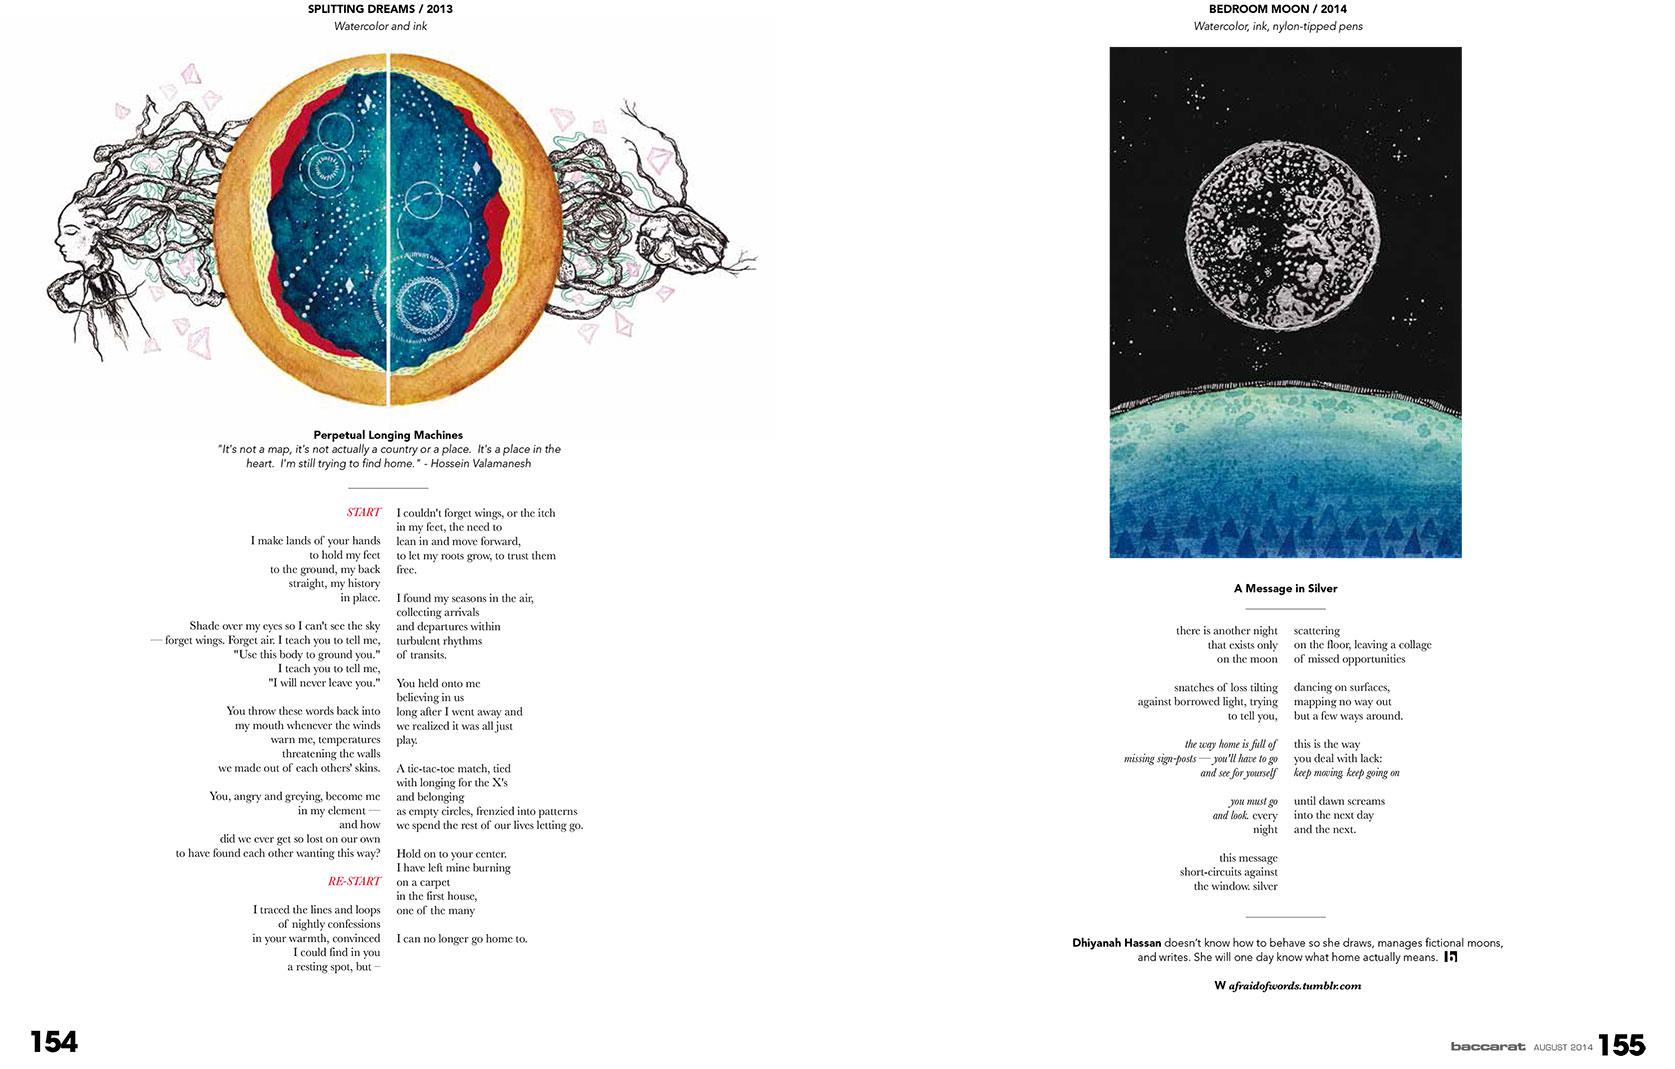 Aug14_BACCARAT-Art-Dhiyanah-Hassan-4pp-2.jpg